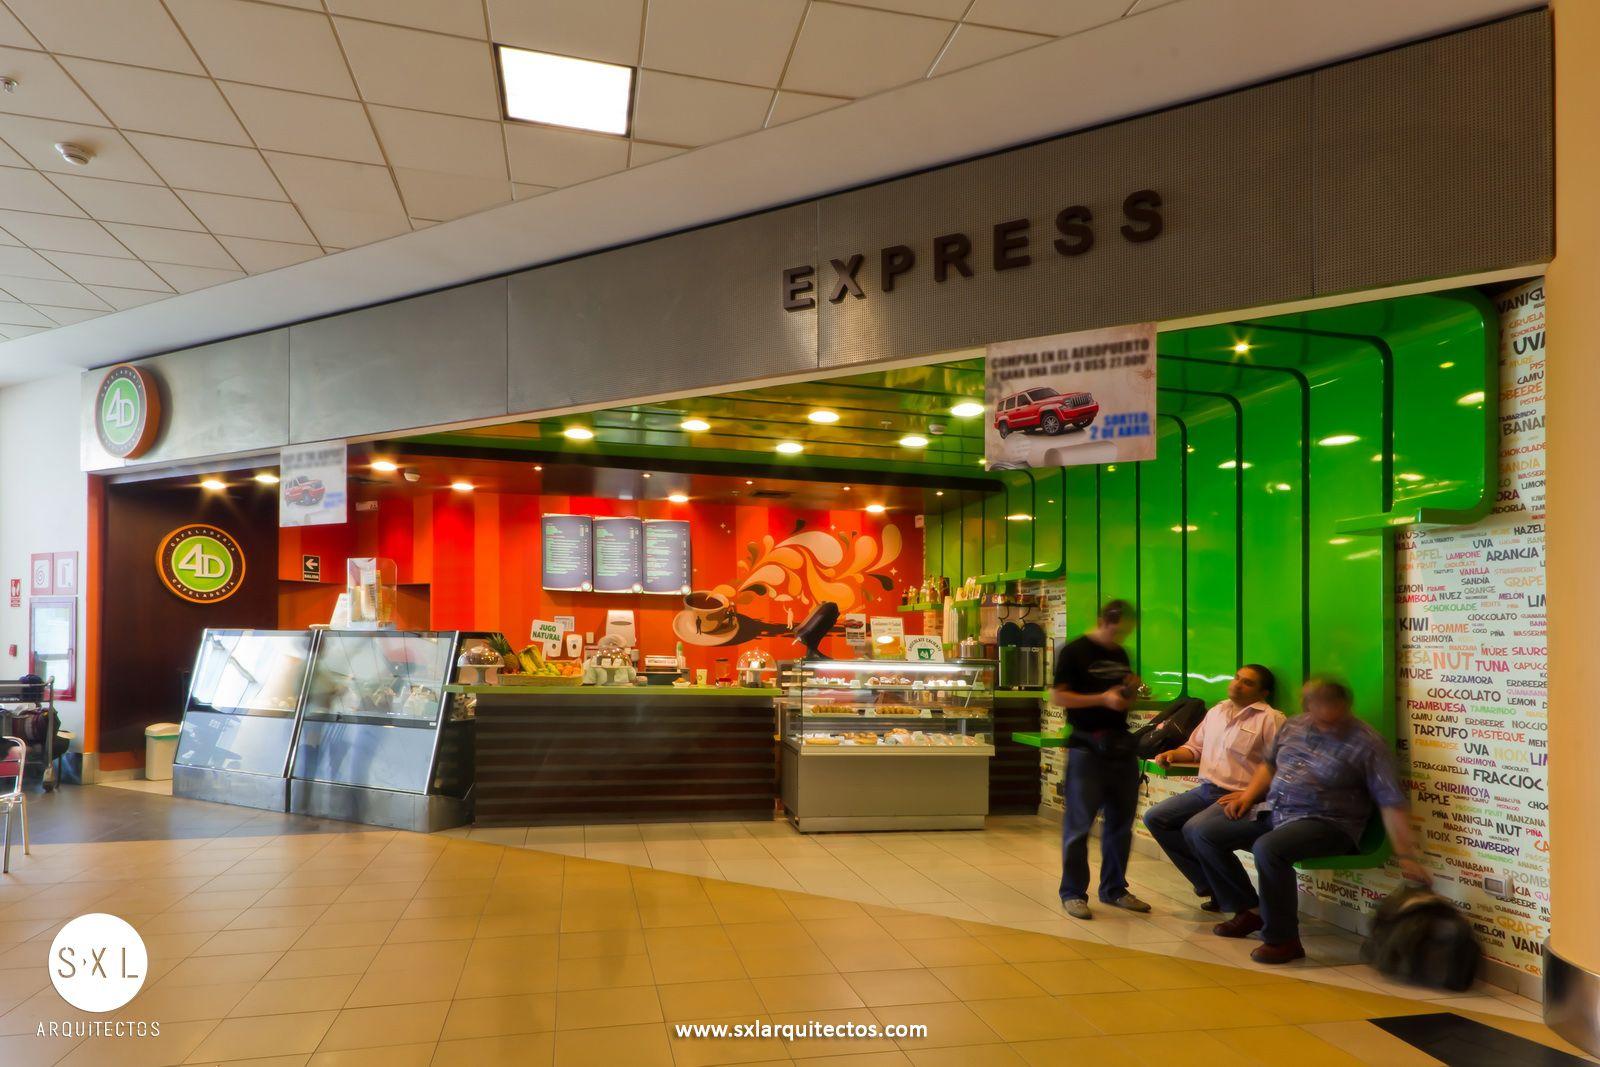 Dise o de caf helader a 4d express en el aeropuerto for Diseno de interiores lima